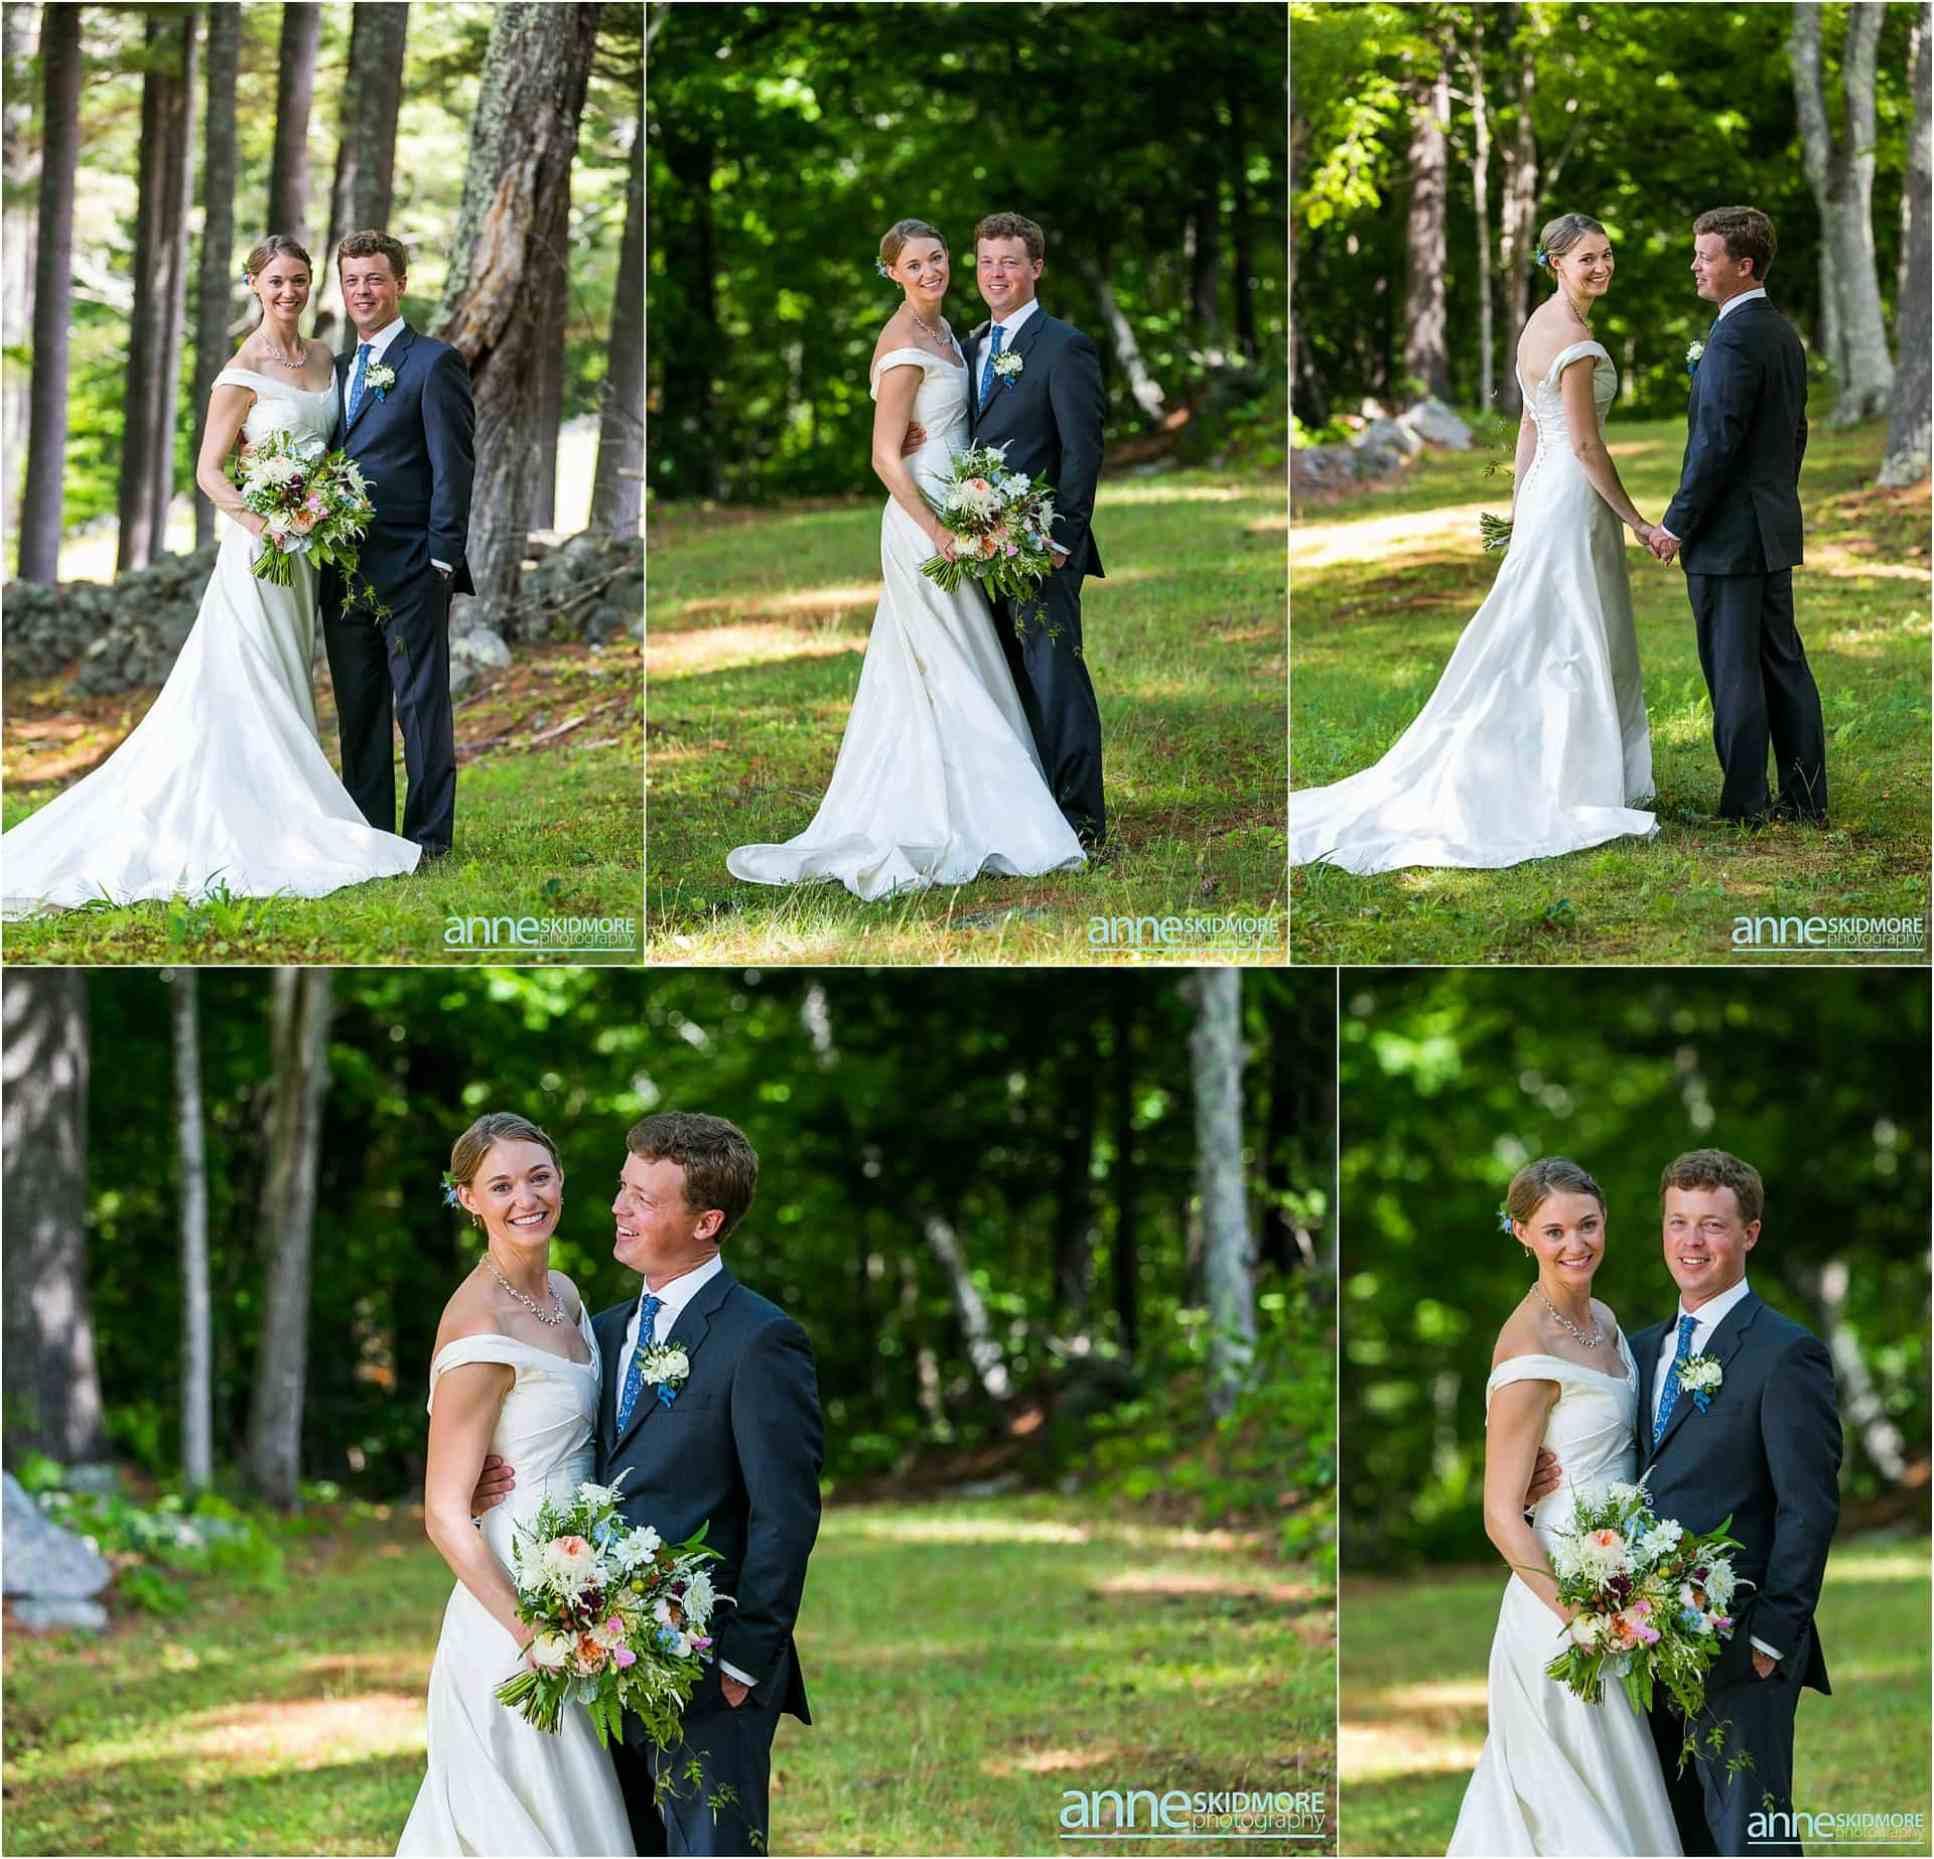 new_hampshire_wedding_photography_0027